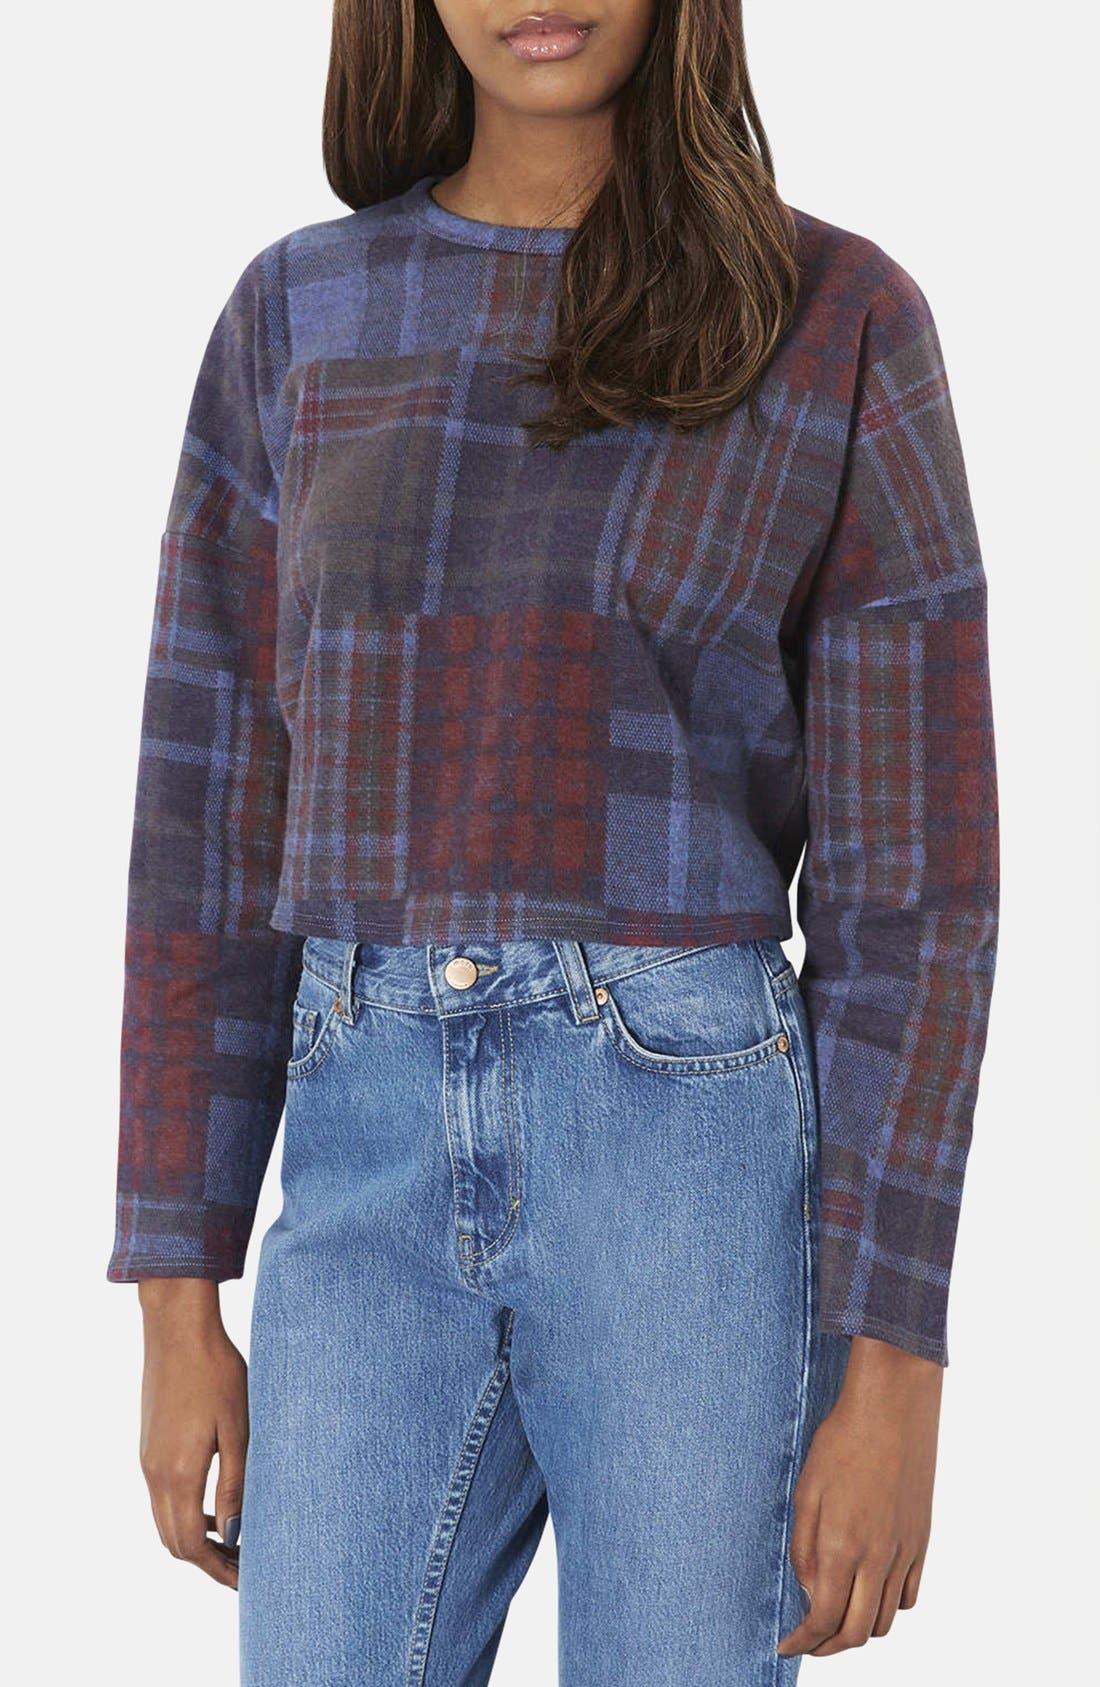 Main Image - Topshop Boxy Check Print Cotton Sweatshirt